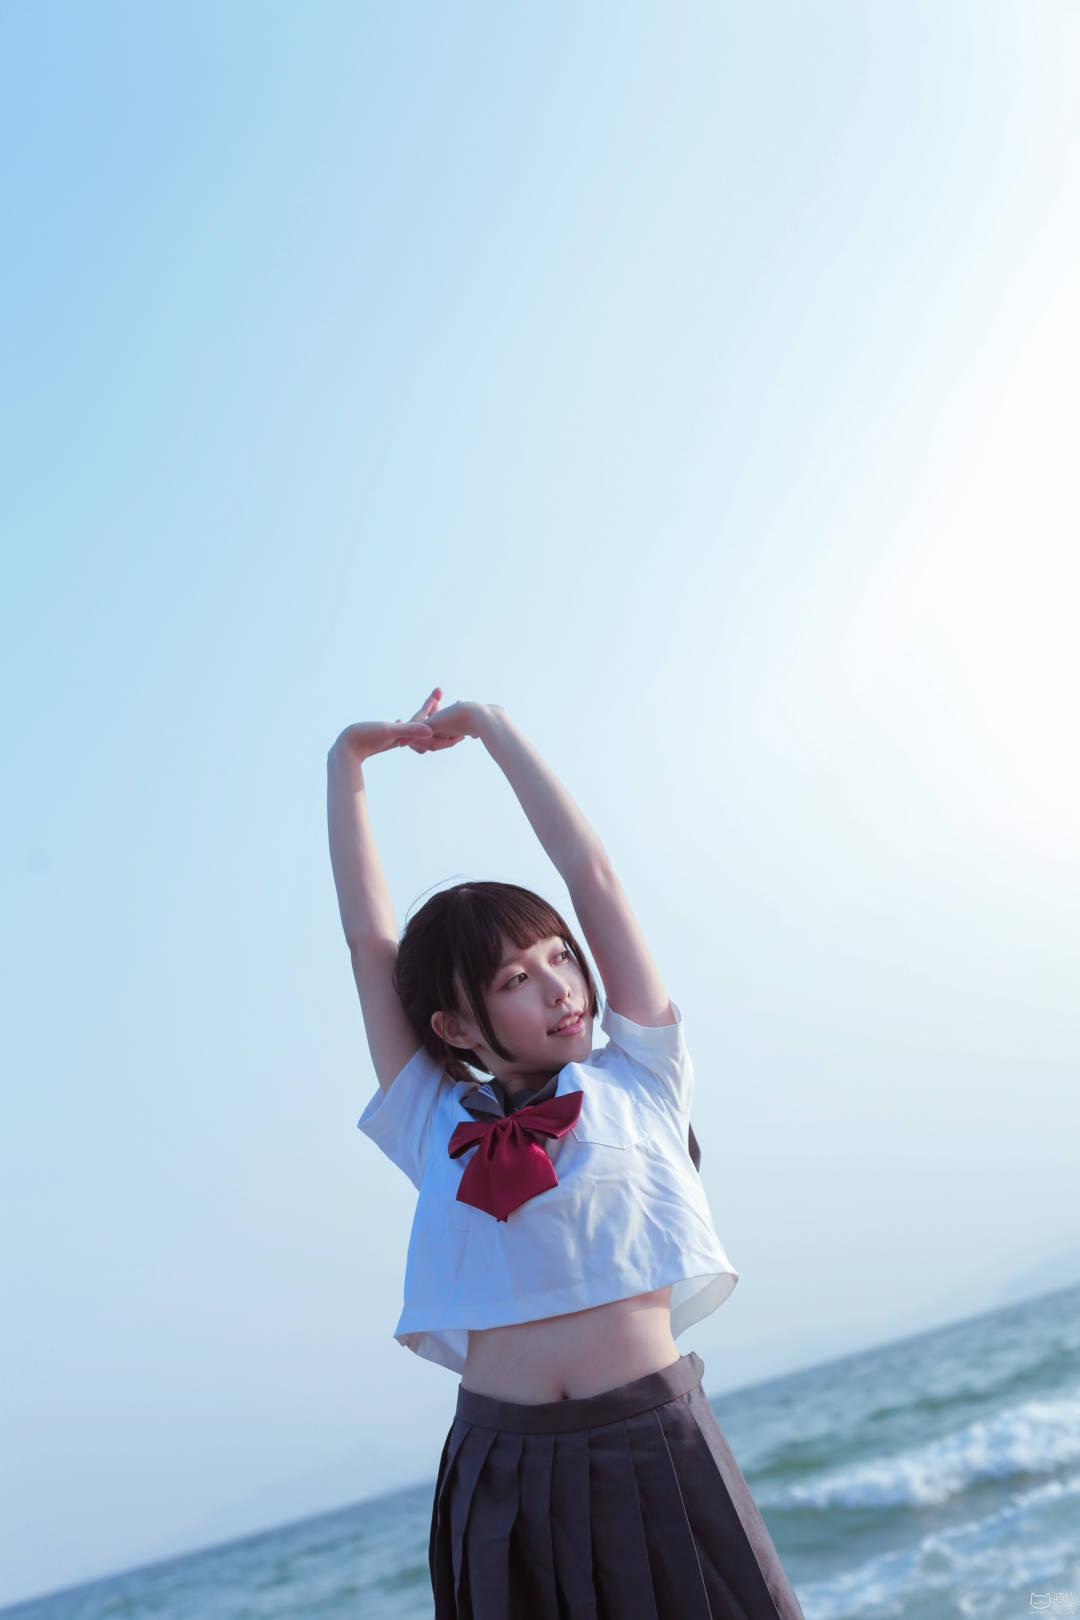 Ruya露叶.jpg